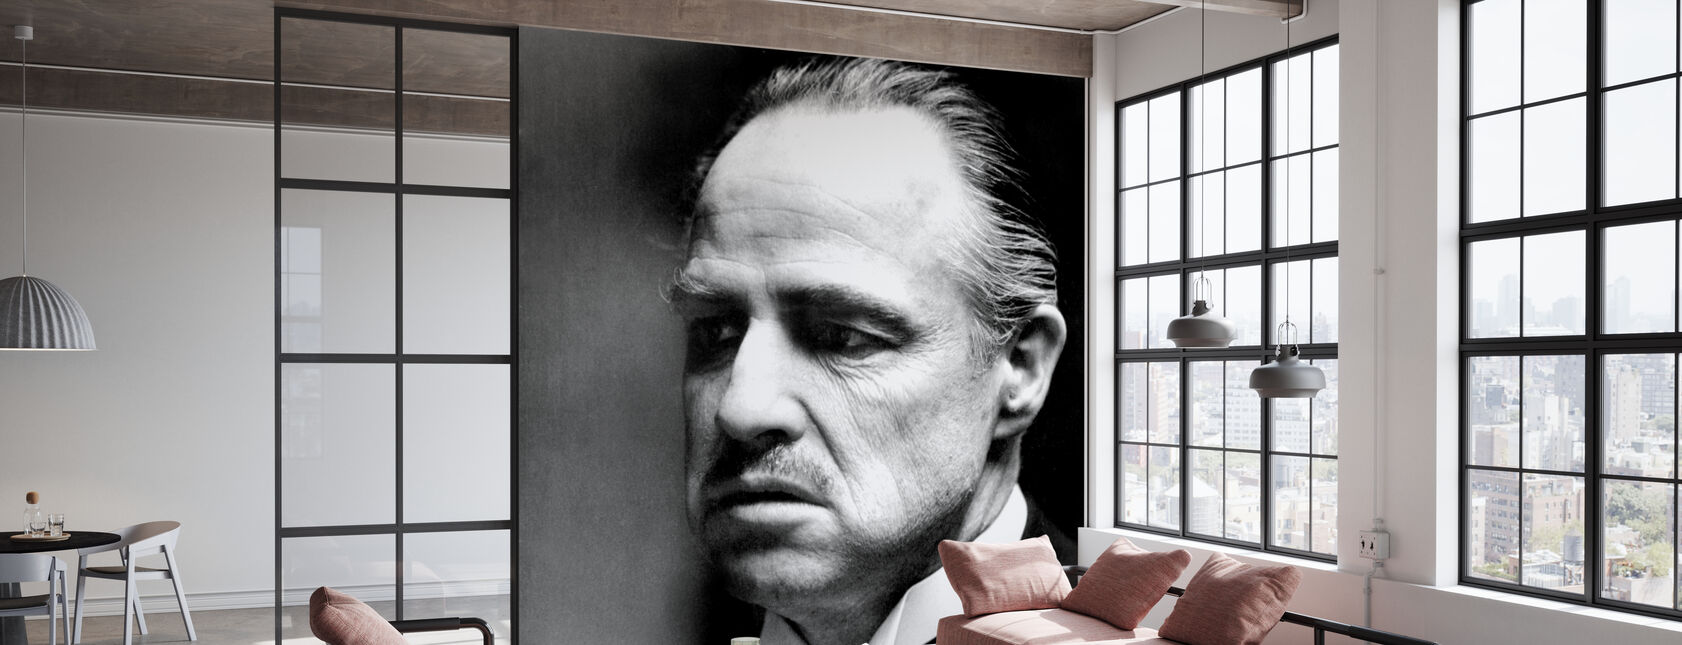 Gudfaren - Don Vito Corleone - Tapet - Kontor